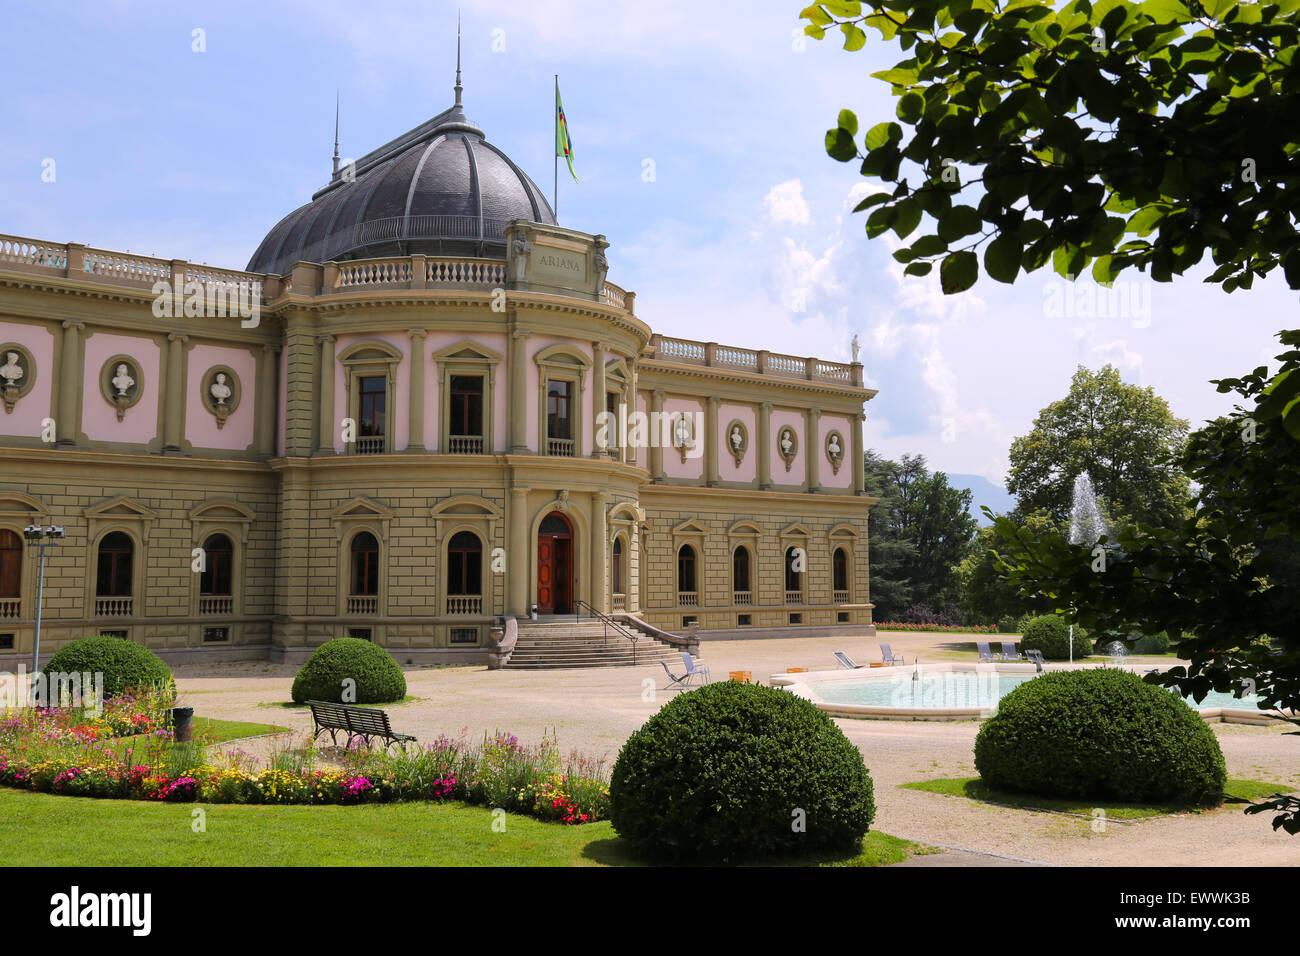 Ariana building with garden view in Geneva, Switzerland Stock Photo